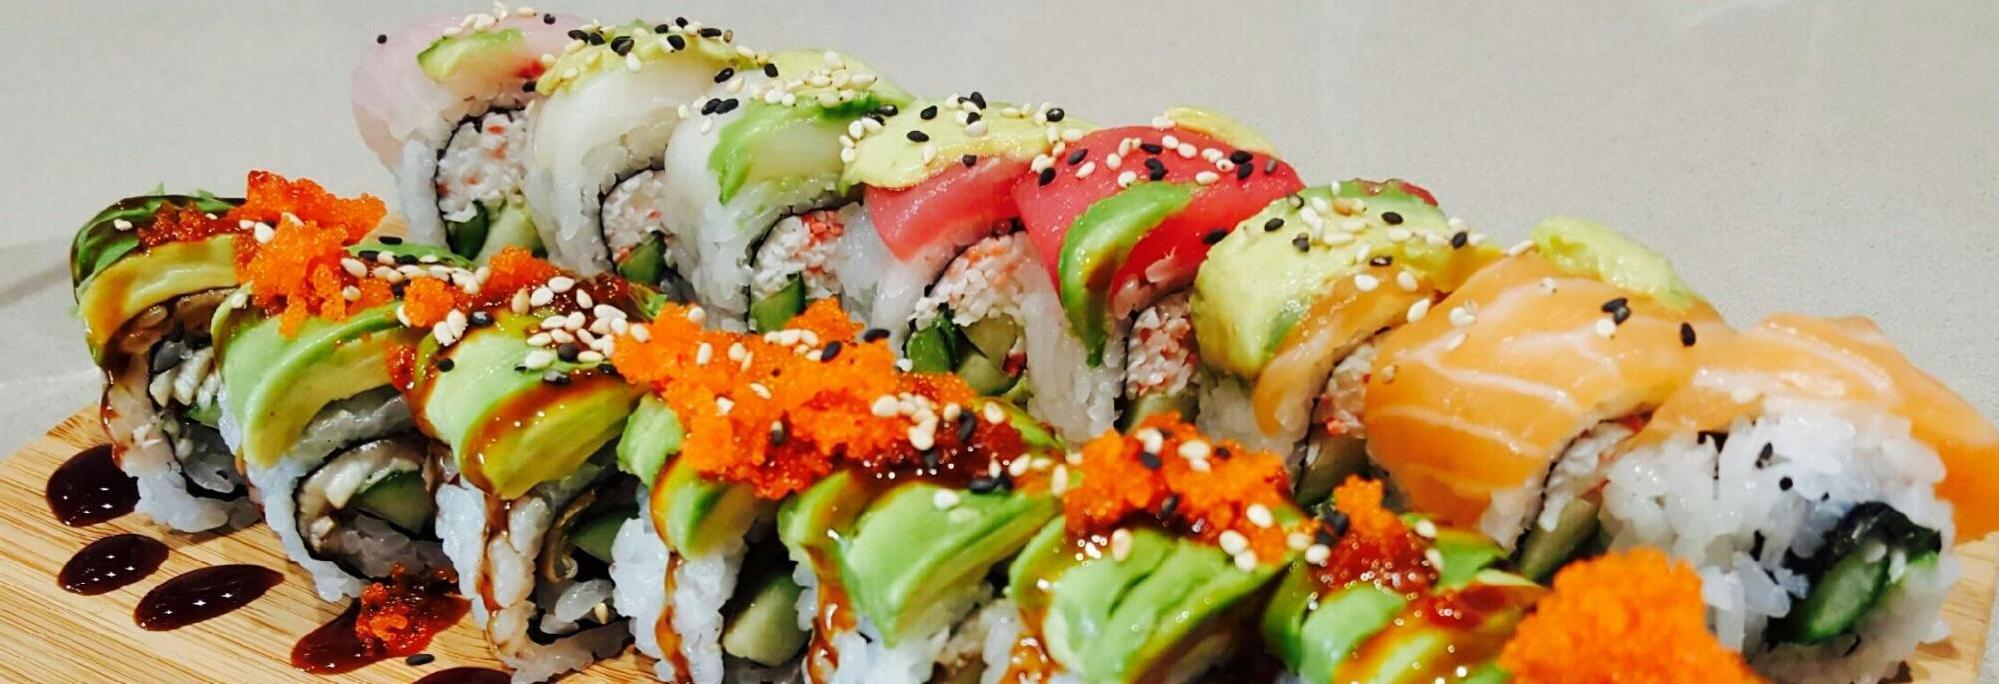 sushi at fuji buffet